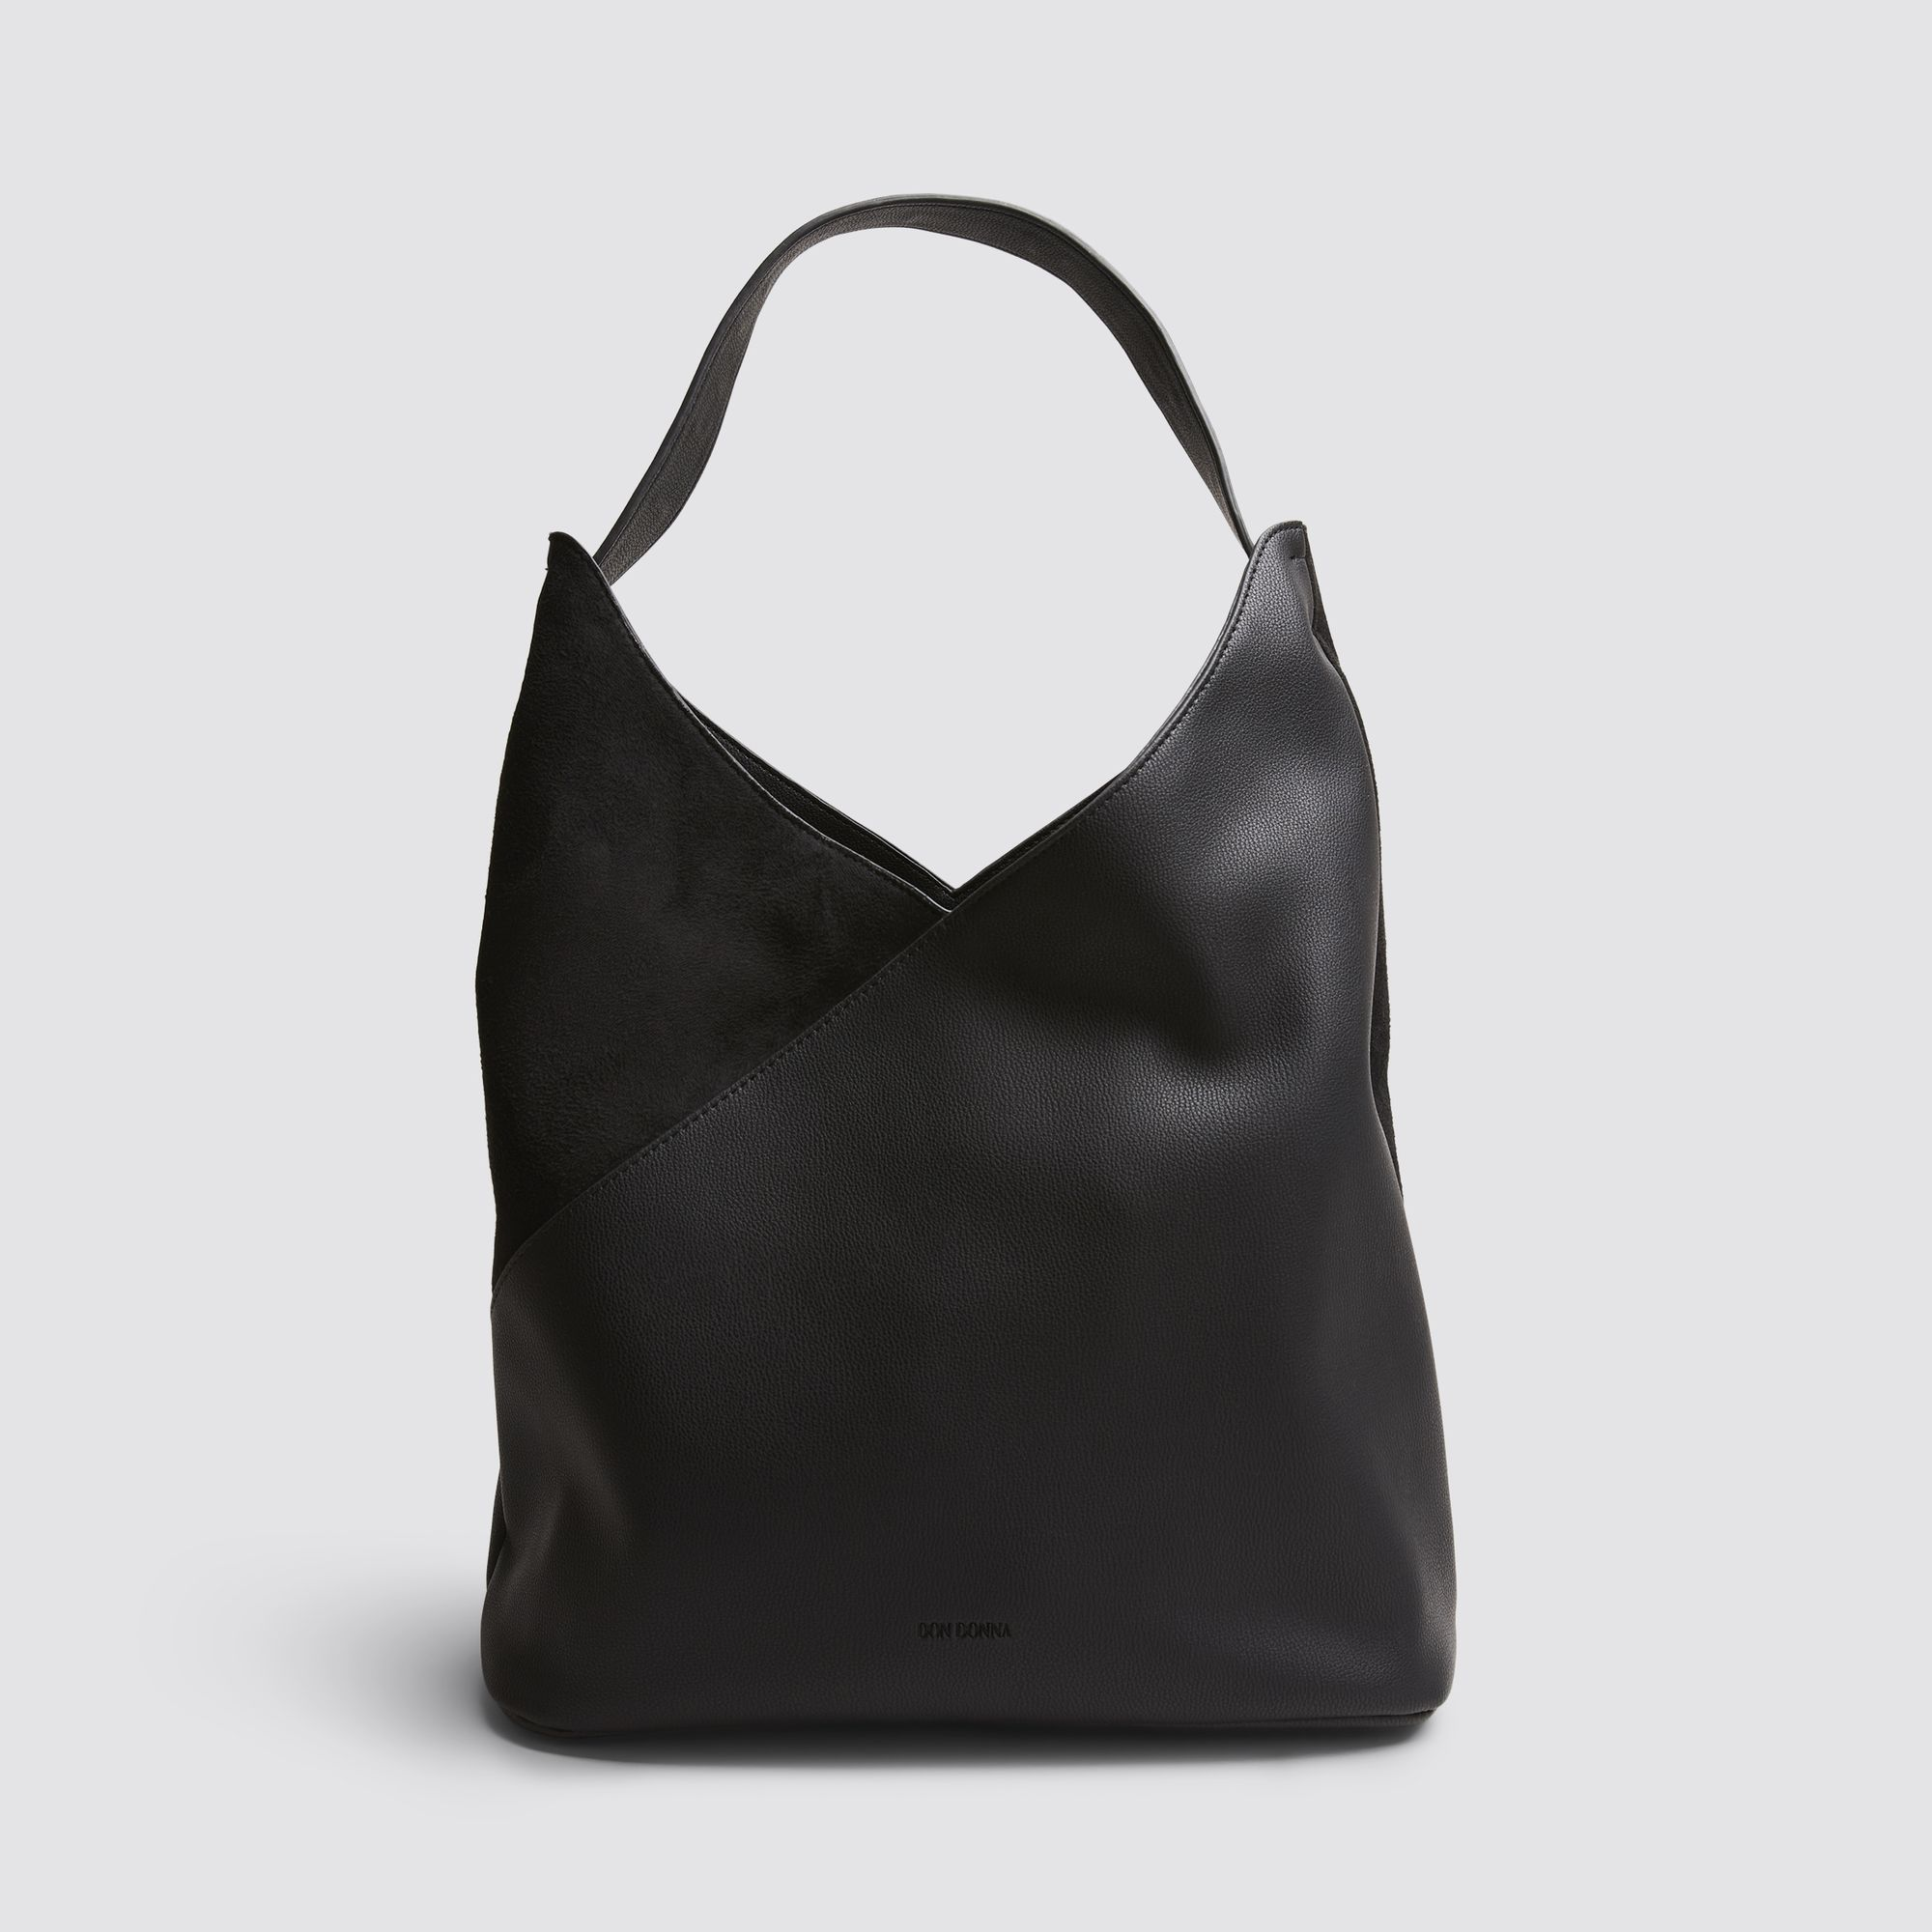 Don Donna Jewel Hobo handväska, Svart